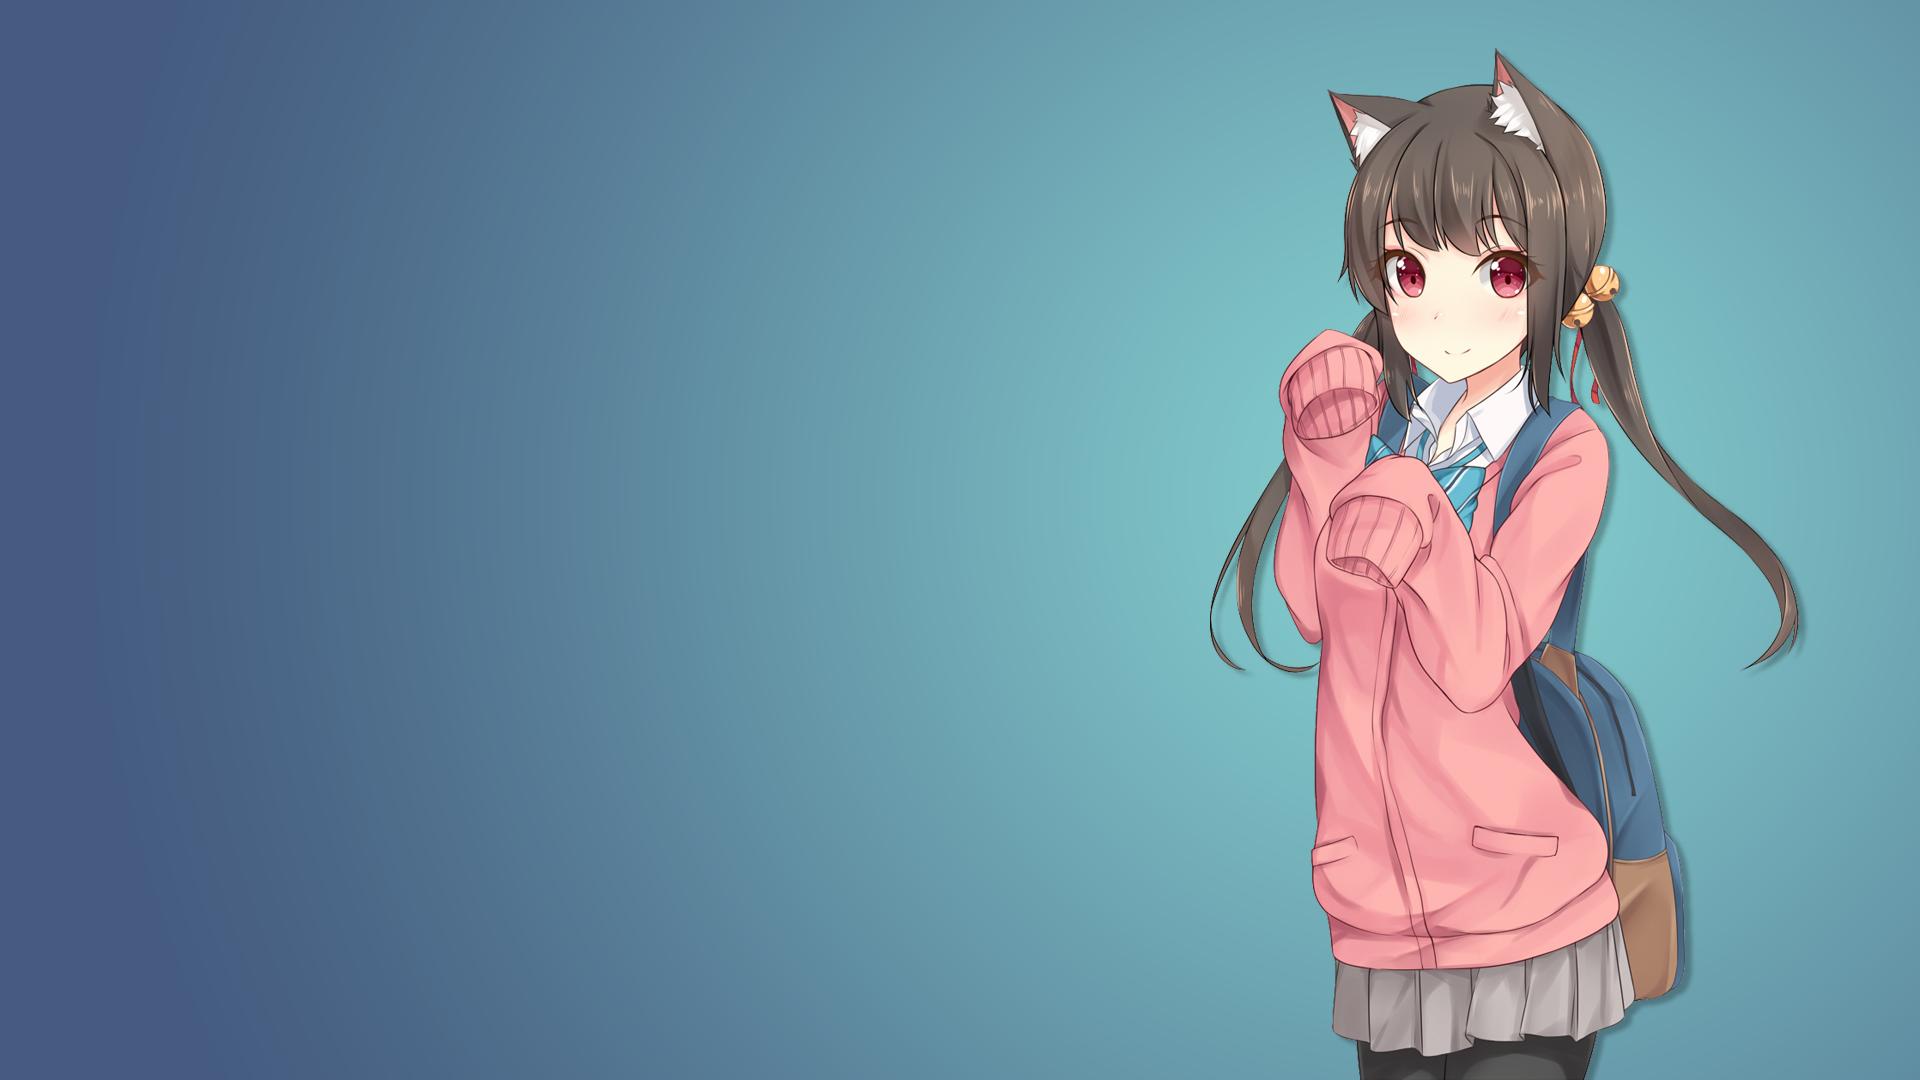 Anime Characters Catgirl : Nekomimi anime girls cat girl original